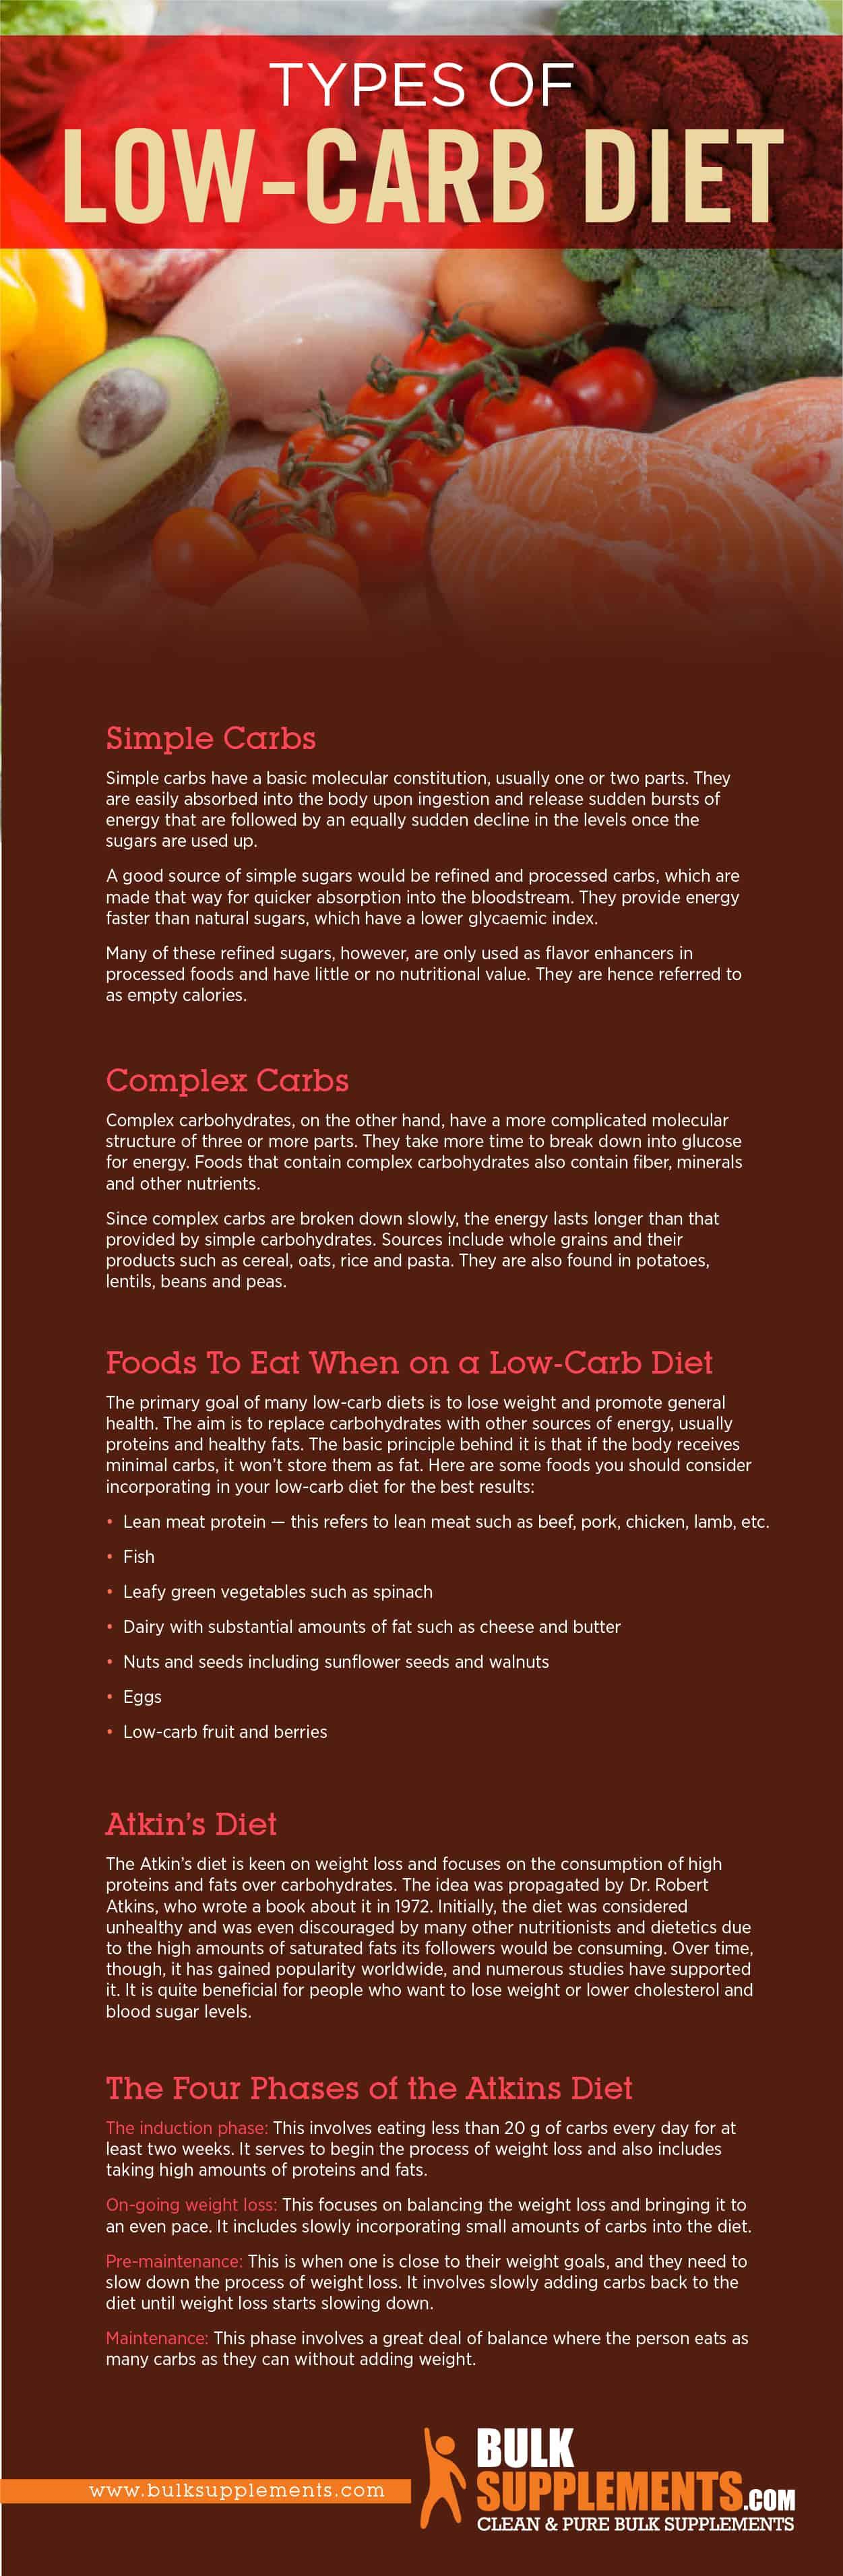 Low-Carb Diet Types